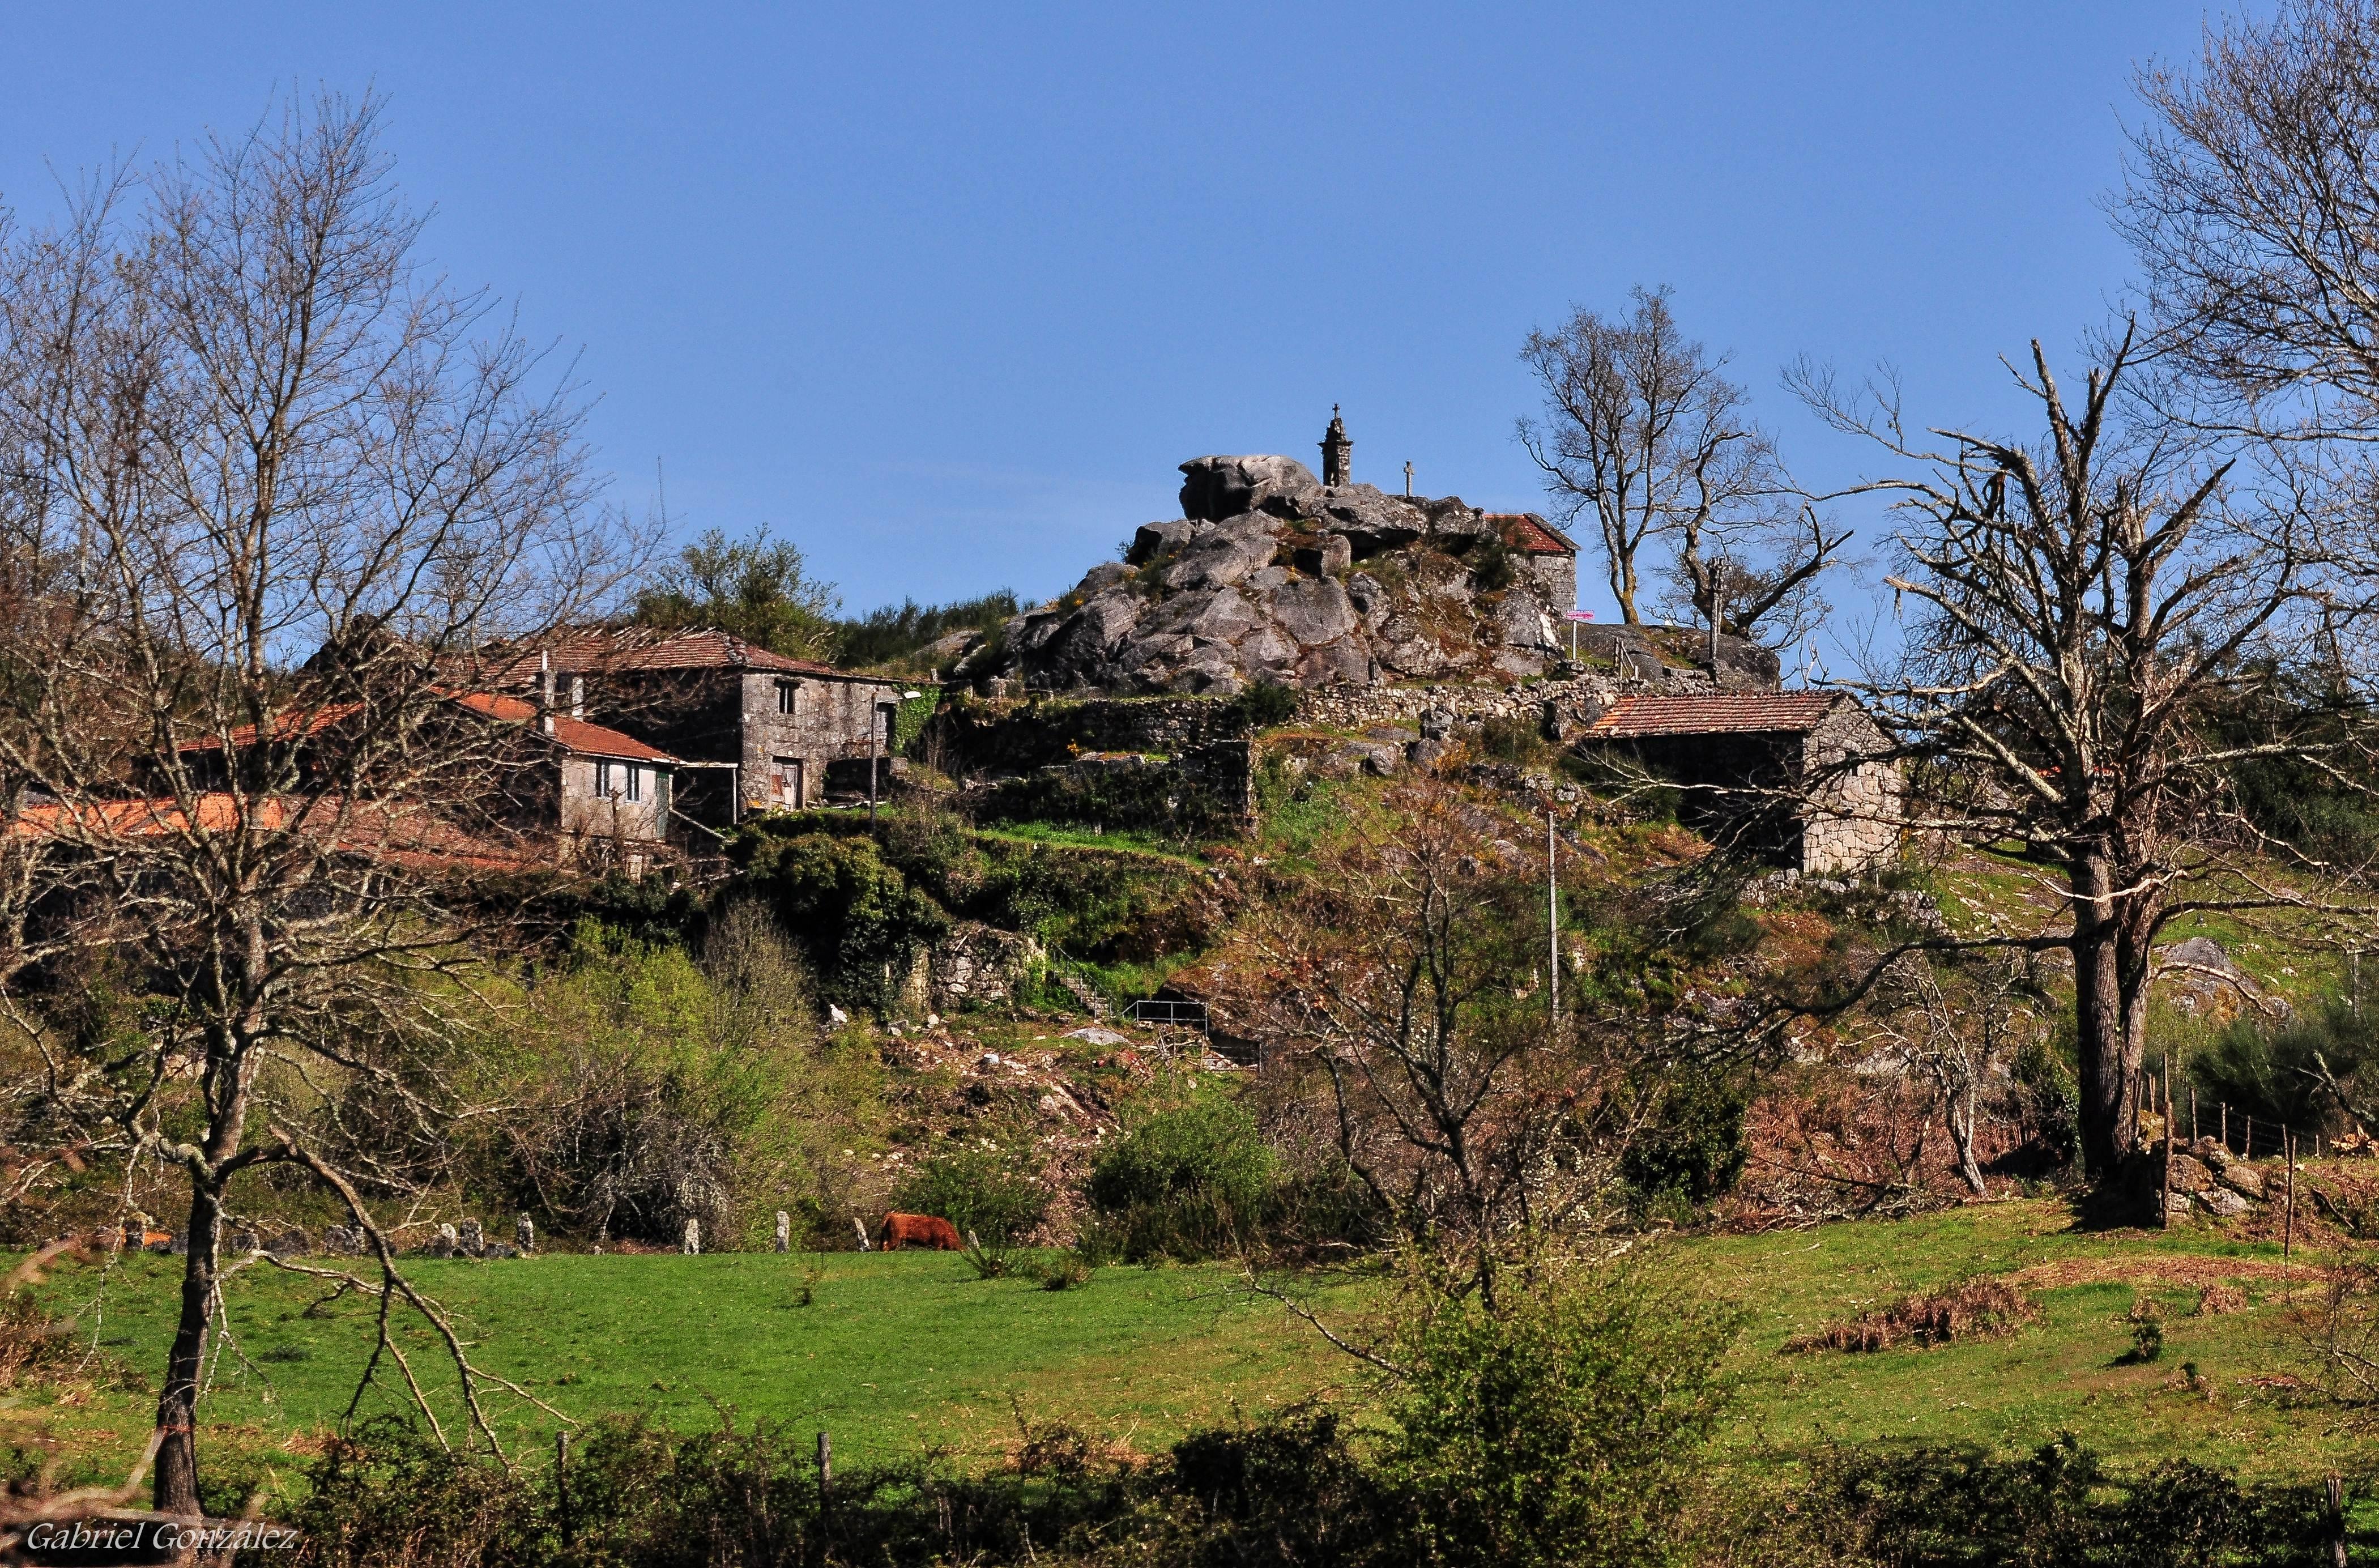 File:Serrapio, Pedre, Cerdedo.jpg - Wikimedia Commons